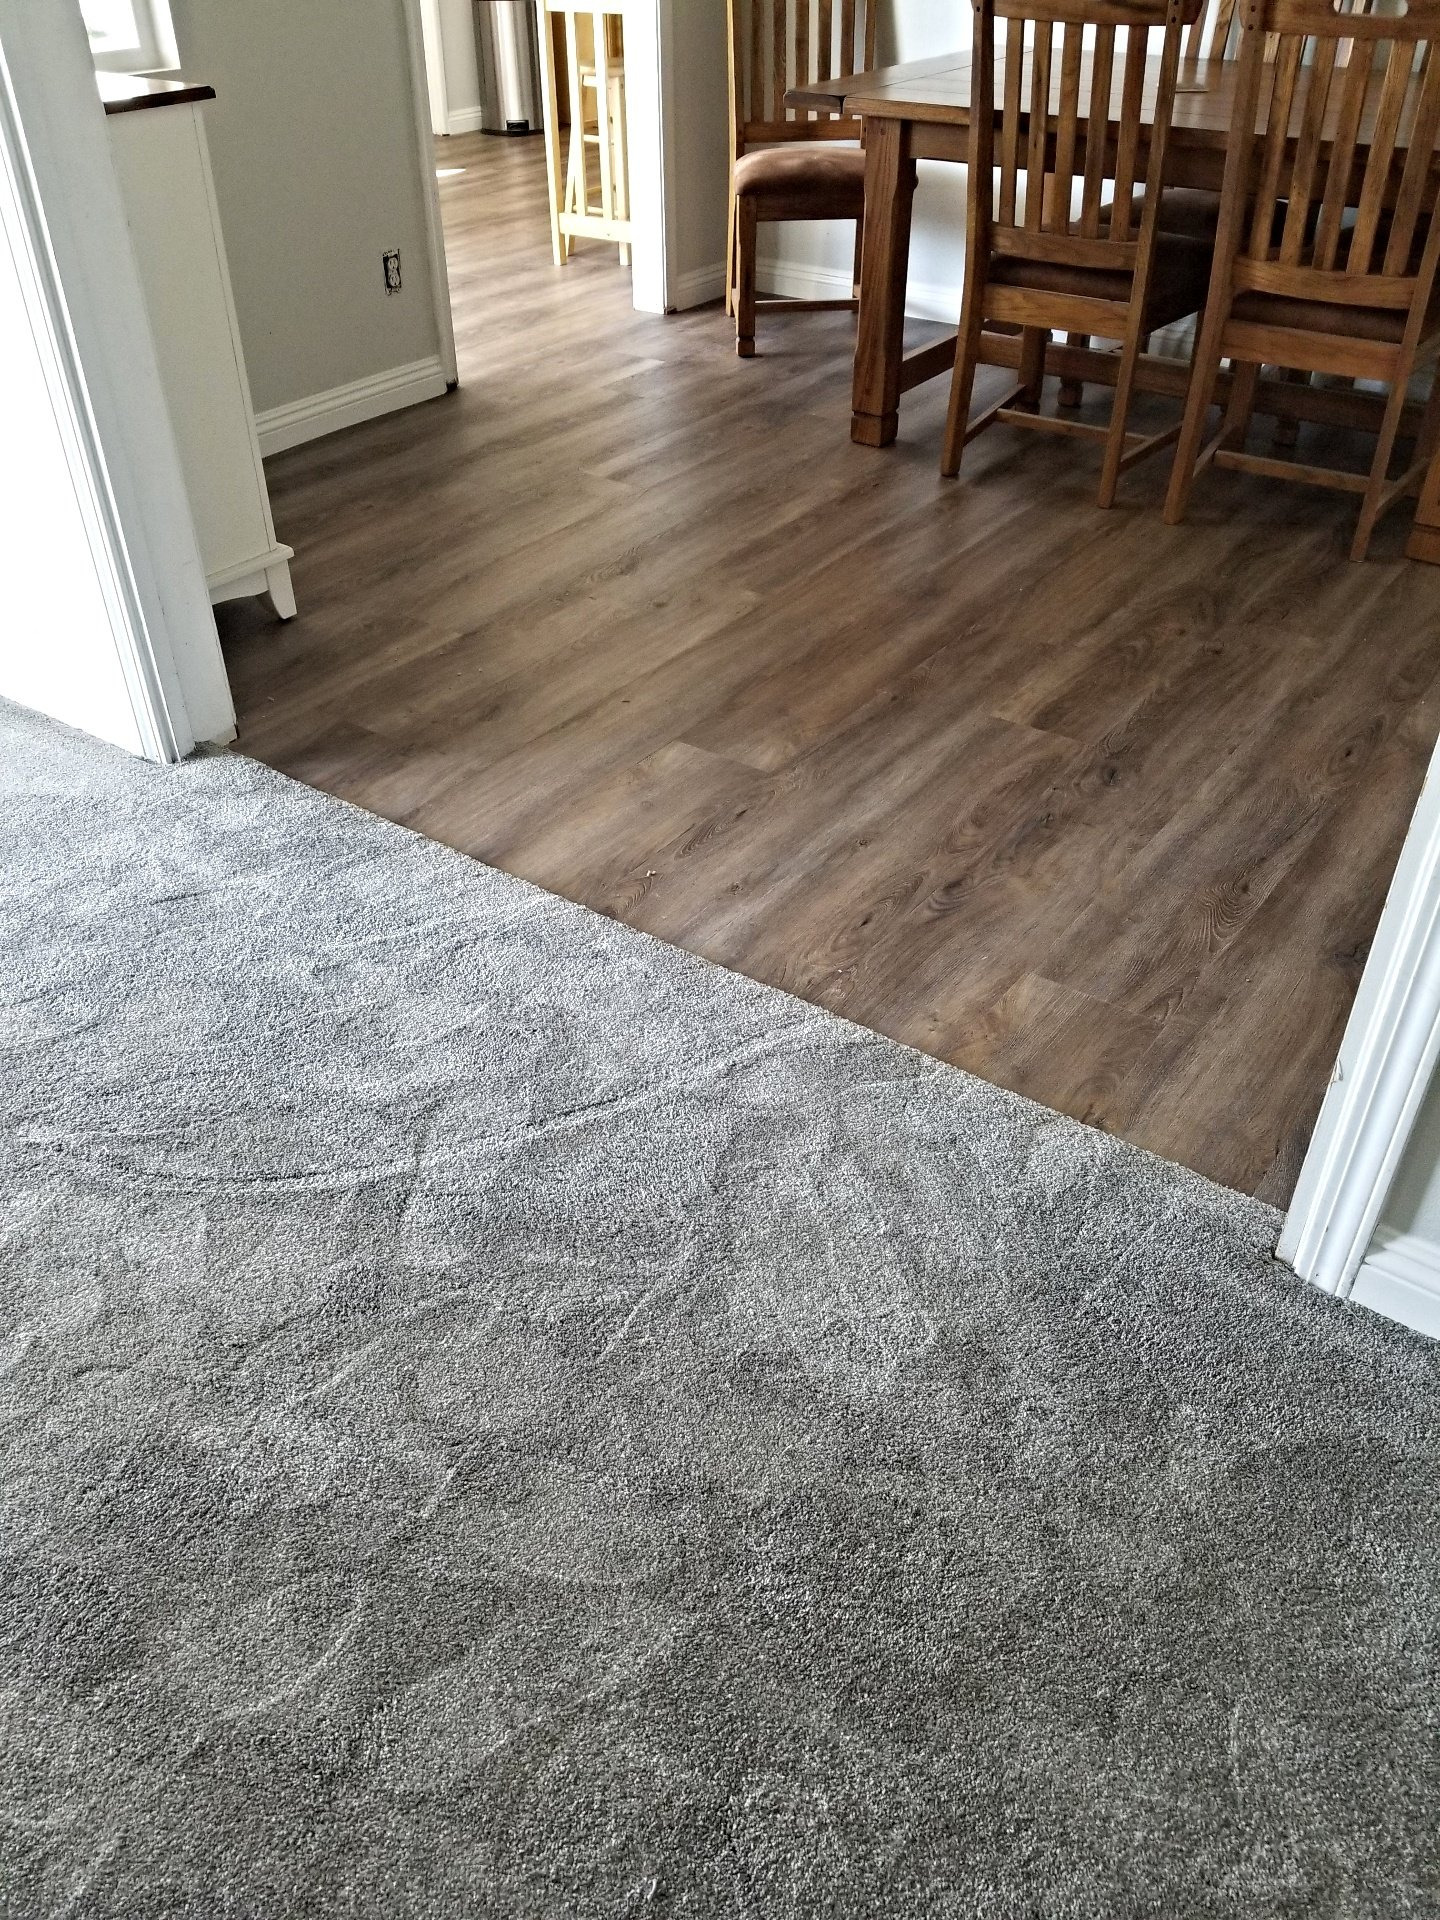 Lexmark Downy Carpet and Prime Waterproof Flooring